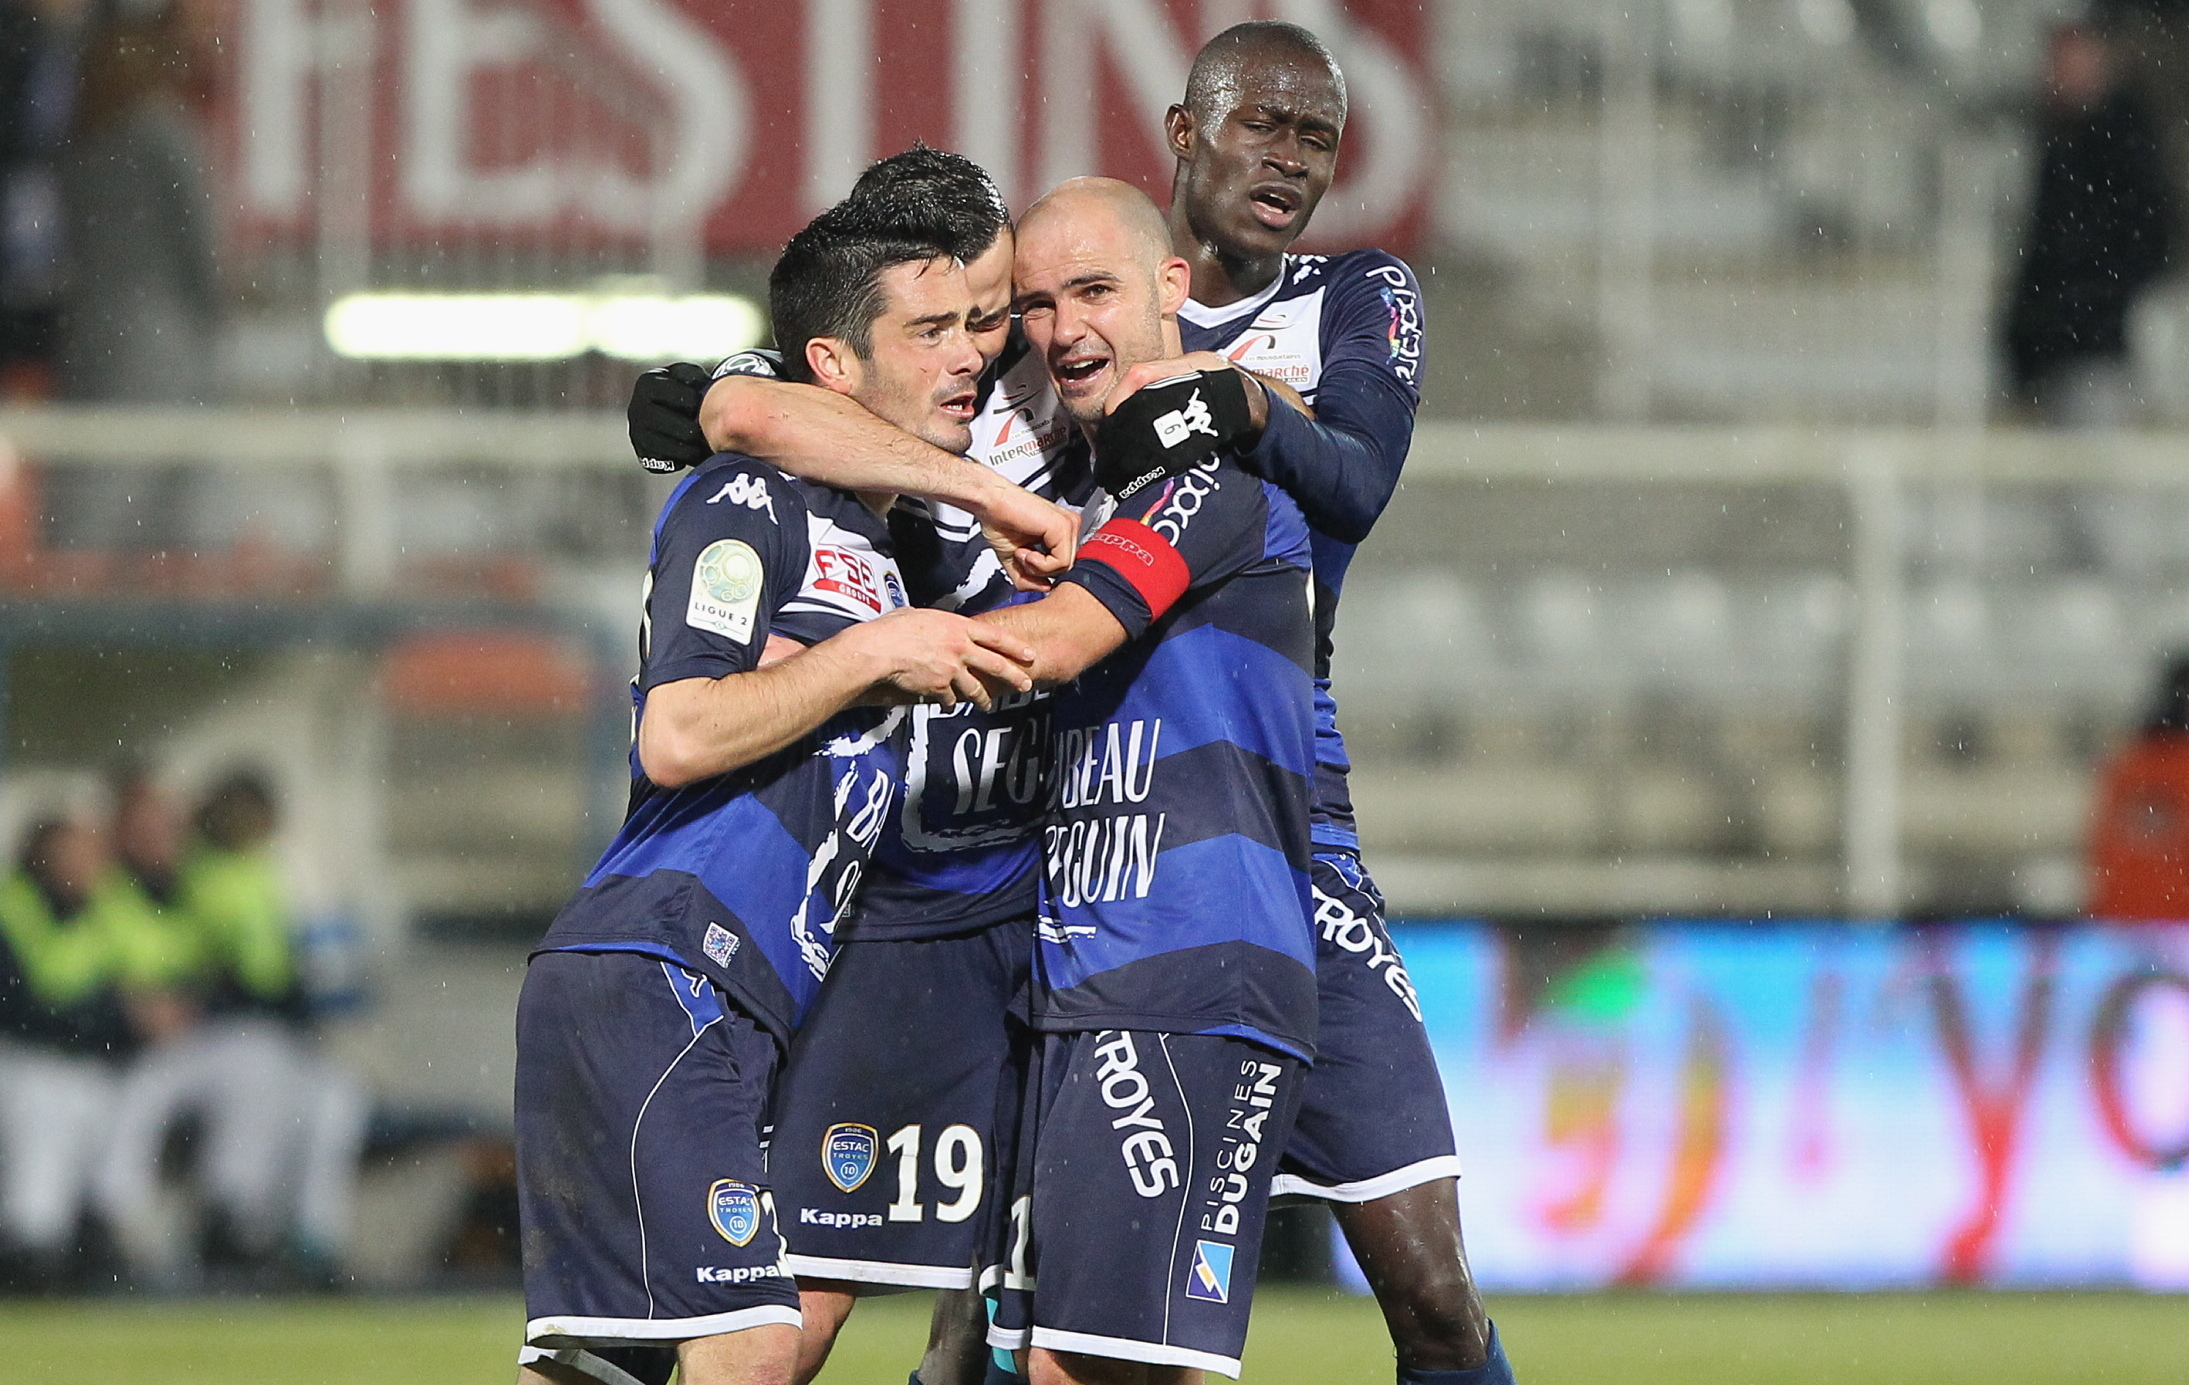 Infos Sports : Football - </b>Ligue 2 - Troyes se reprend, le &#171;Gaz&#187; s'arr&#234;te